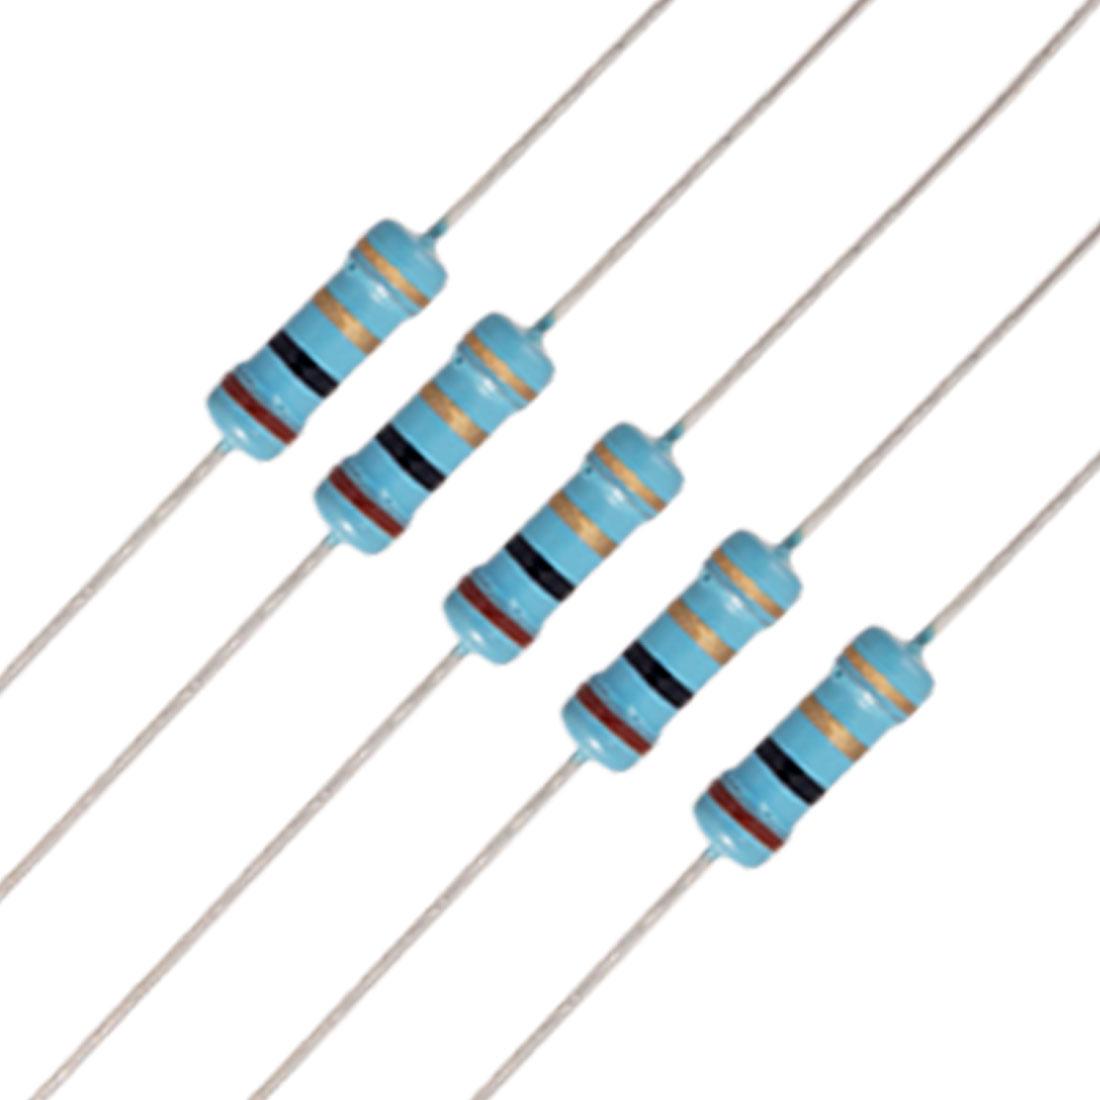 20 x 1/2W Watt 1 ohm 1R Metal Film Resistor 0.5W